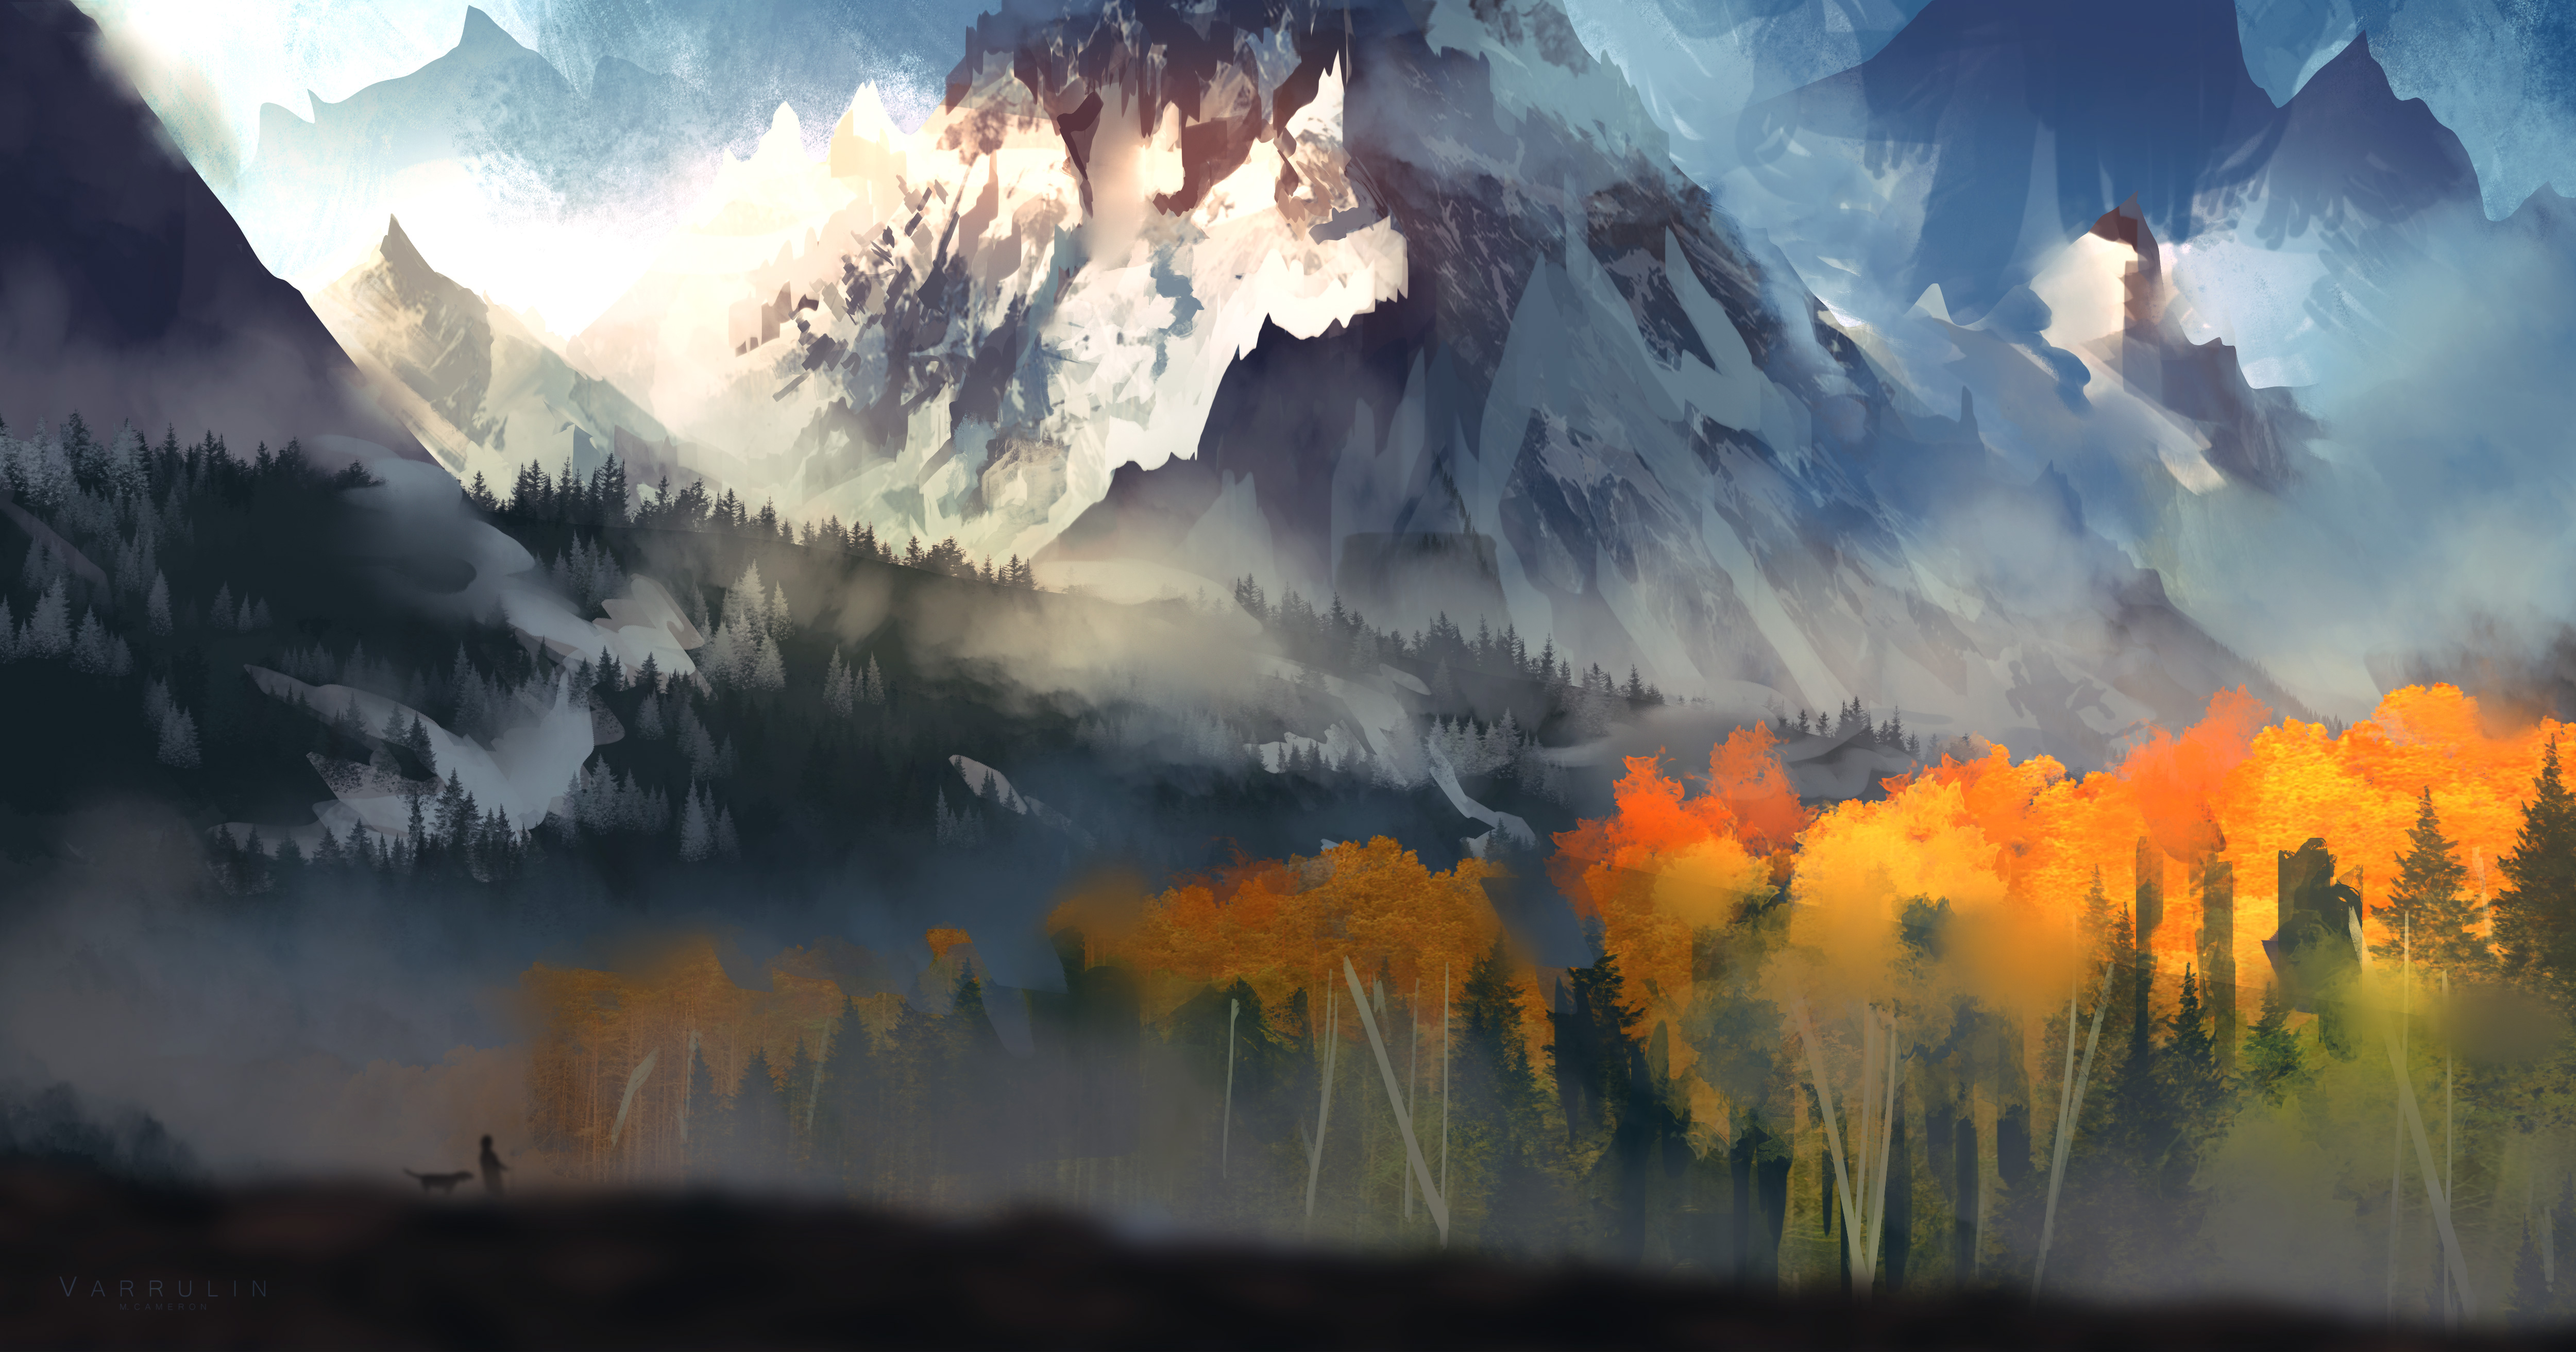 1920x1080 Landscape Scenery Moutain Autumn Digital Art 5k